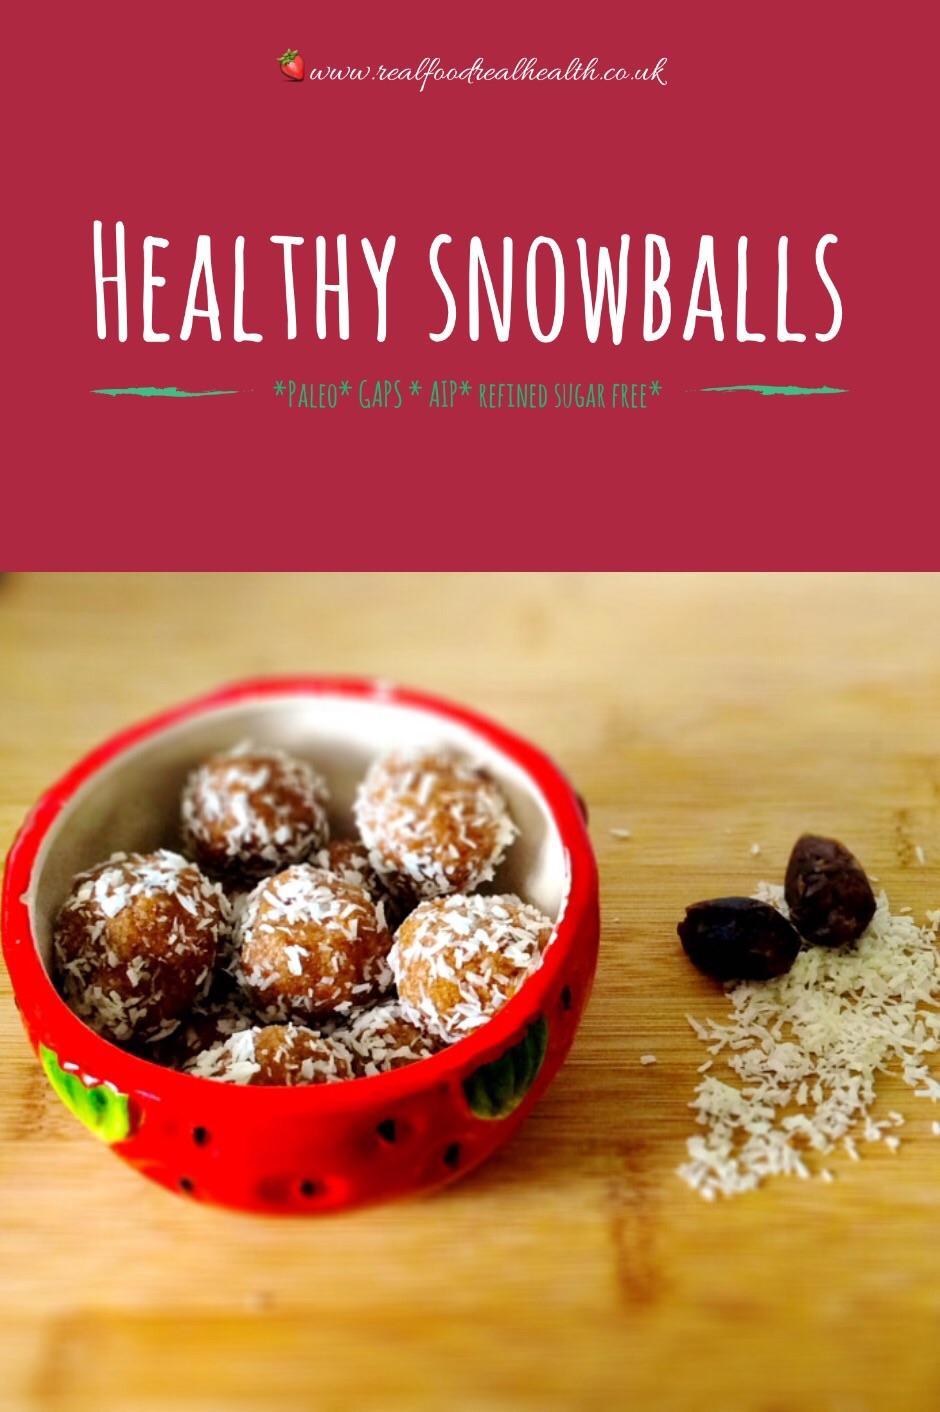 Healthy Snowballs